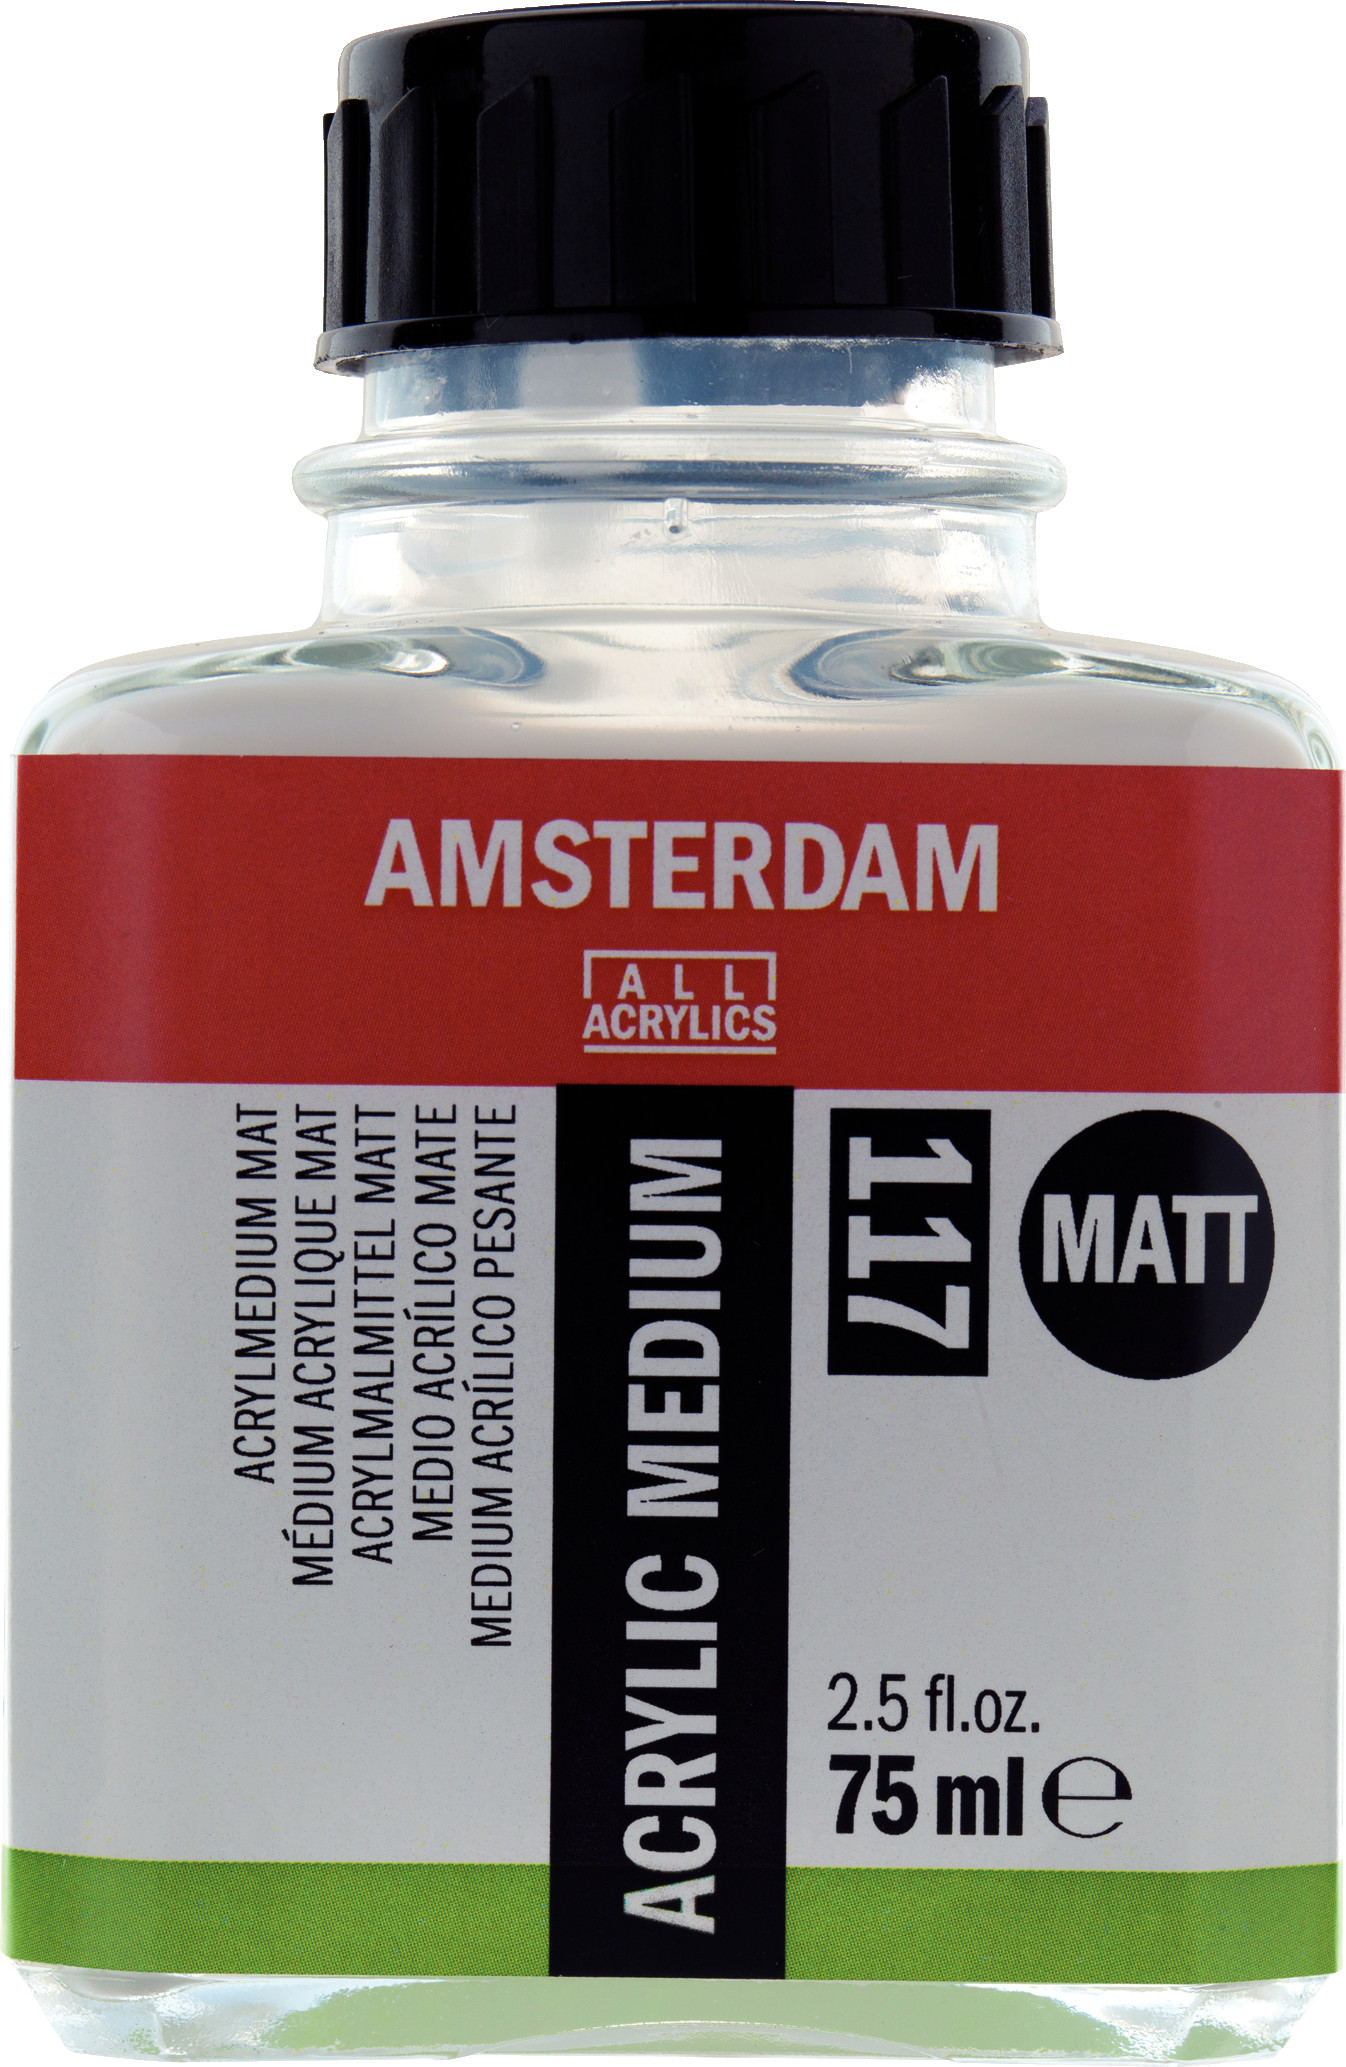 Amsterdam Acrylic Medium Matt Bottle 75 ml